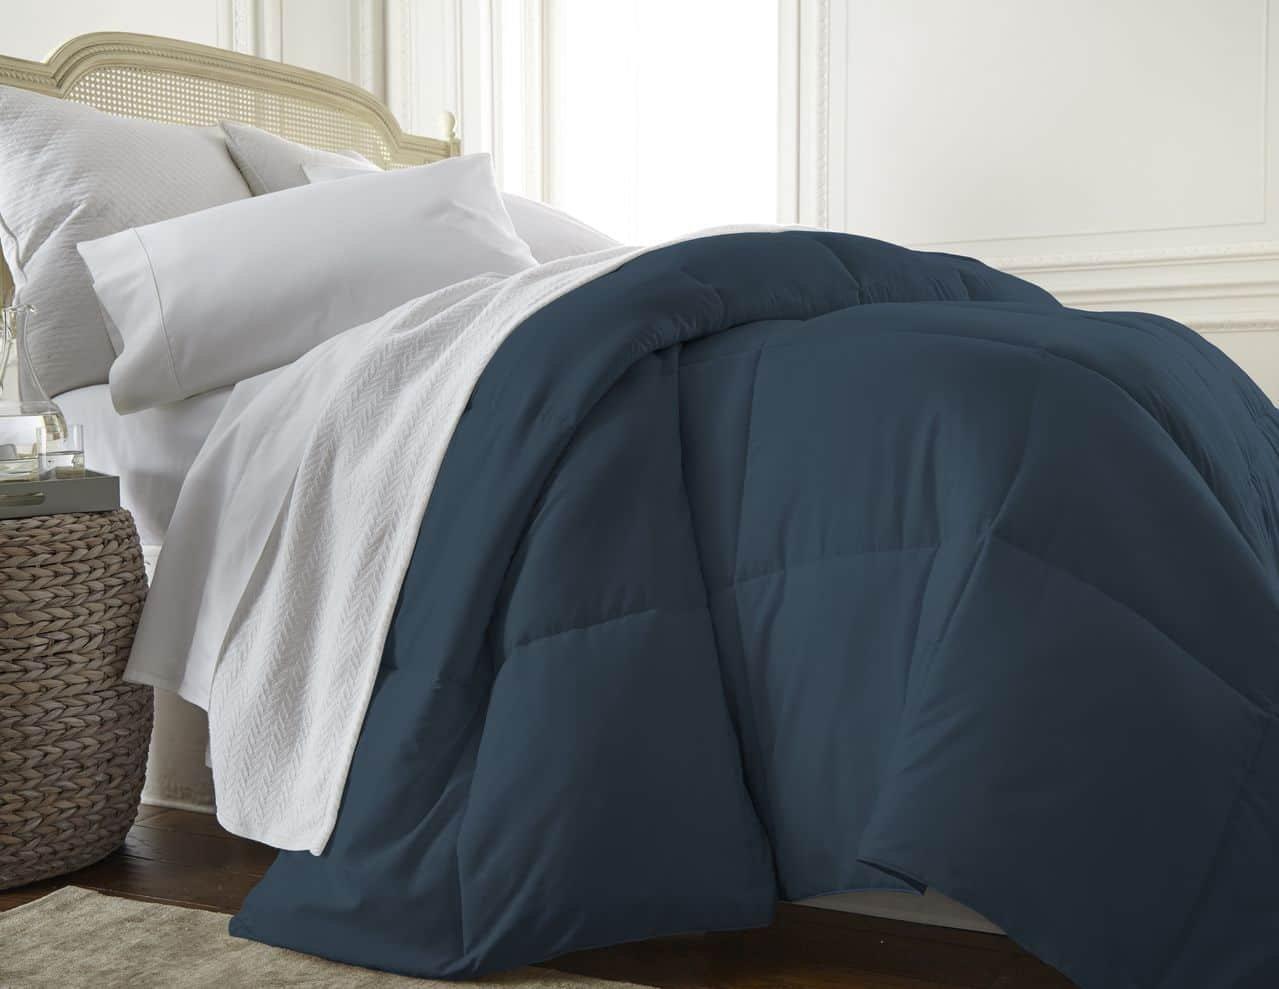 Simply Soft Comforter King//California King Gray ienjoy Home SS-COMFORTER-KING-GRAY